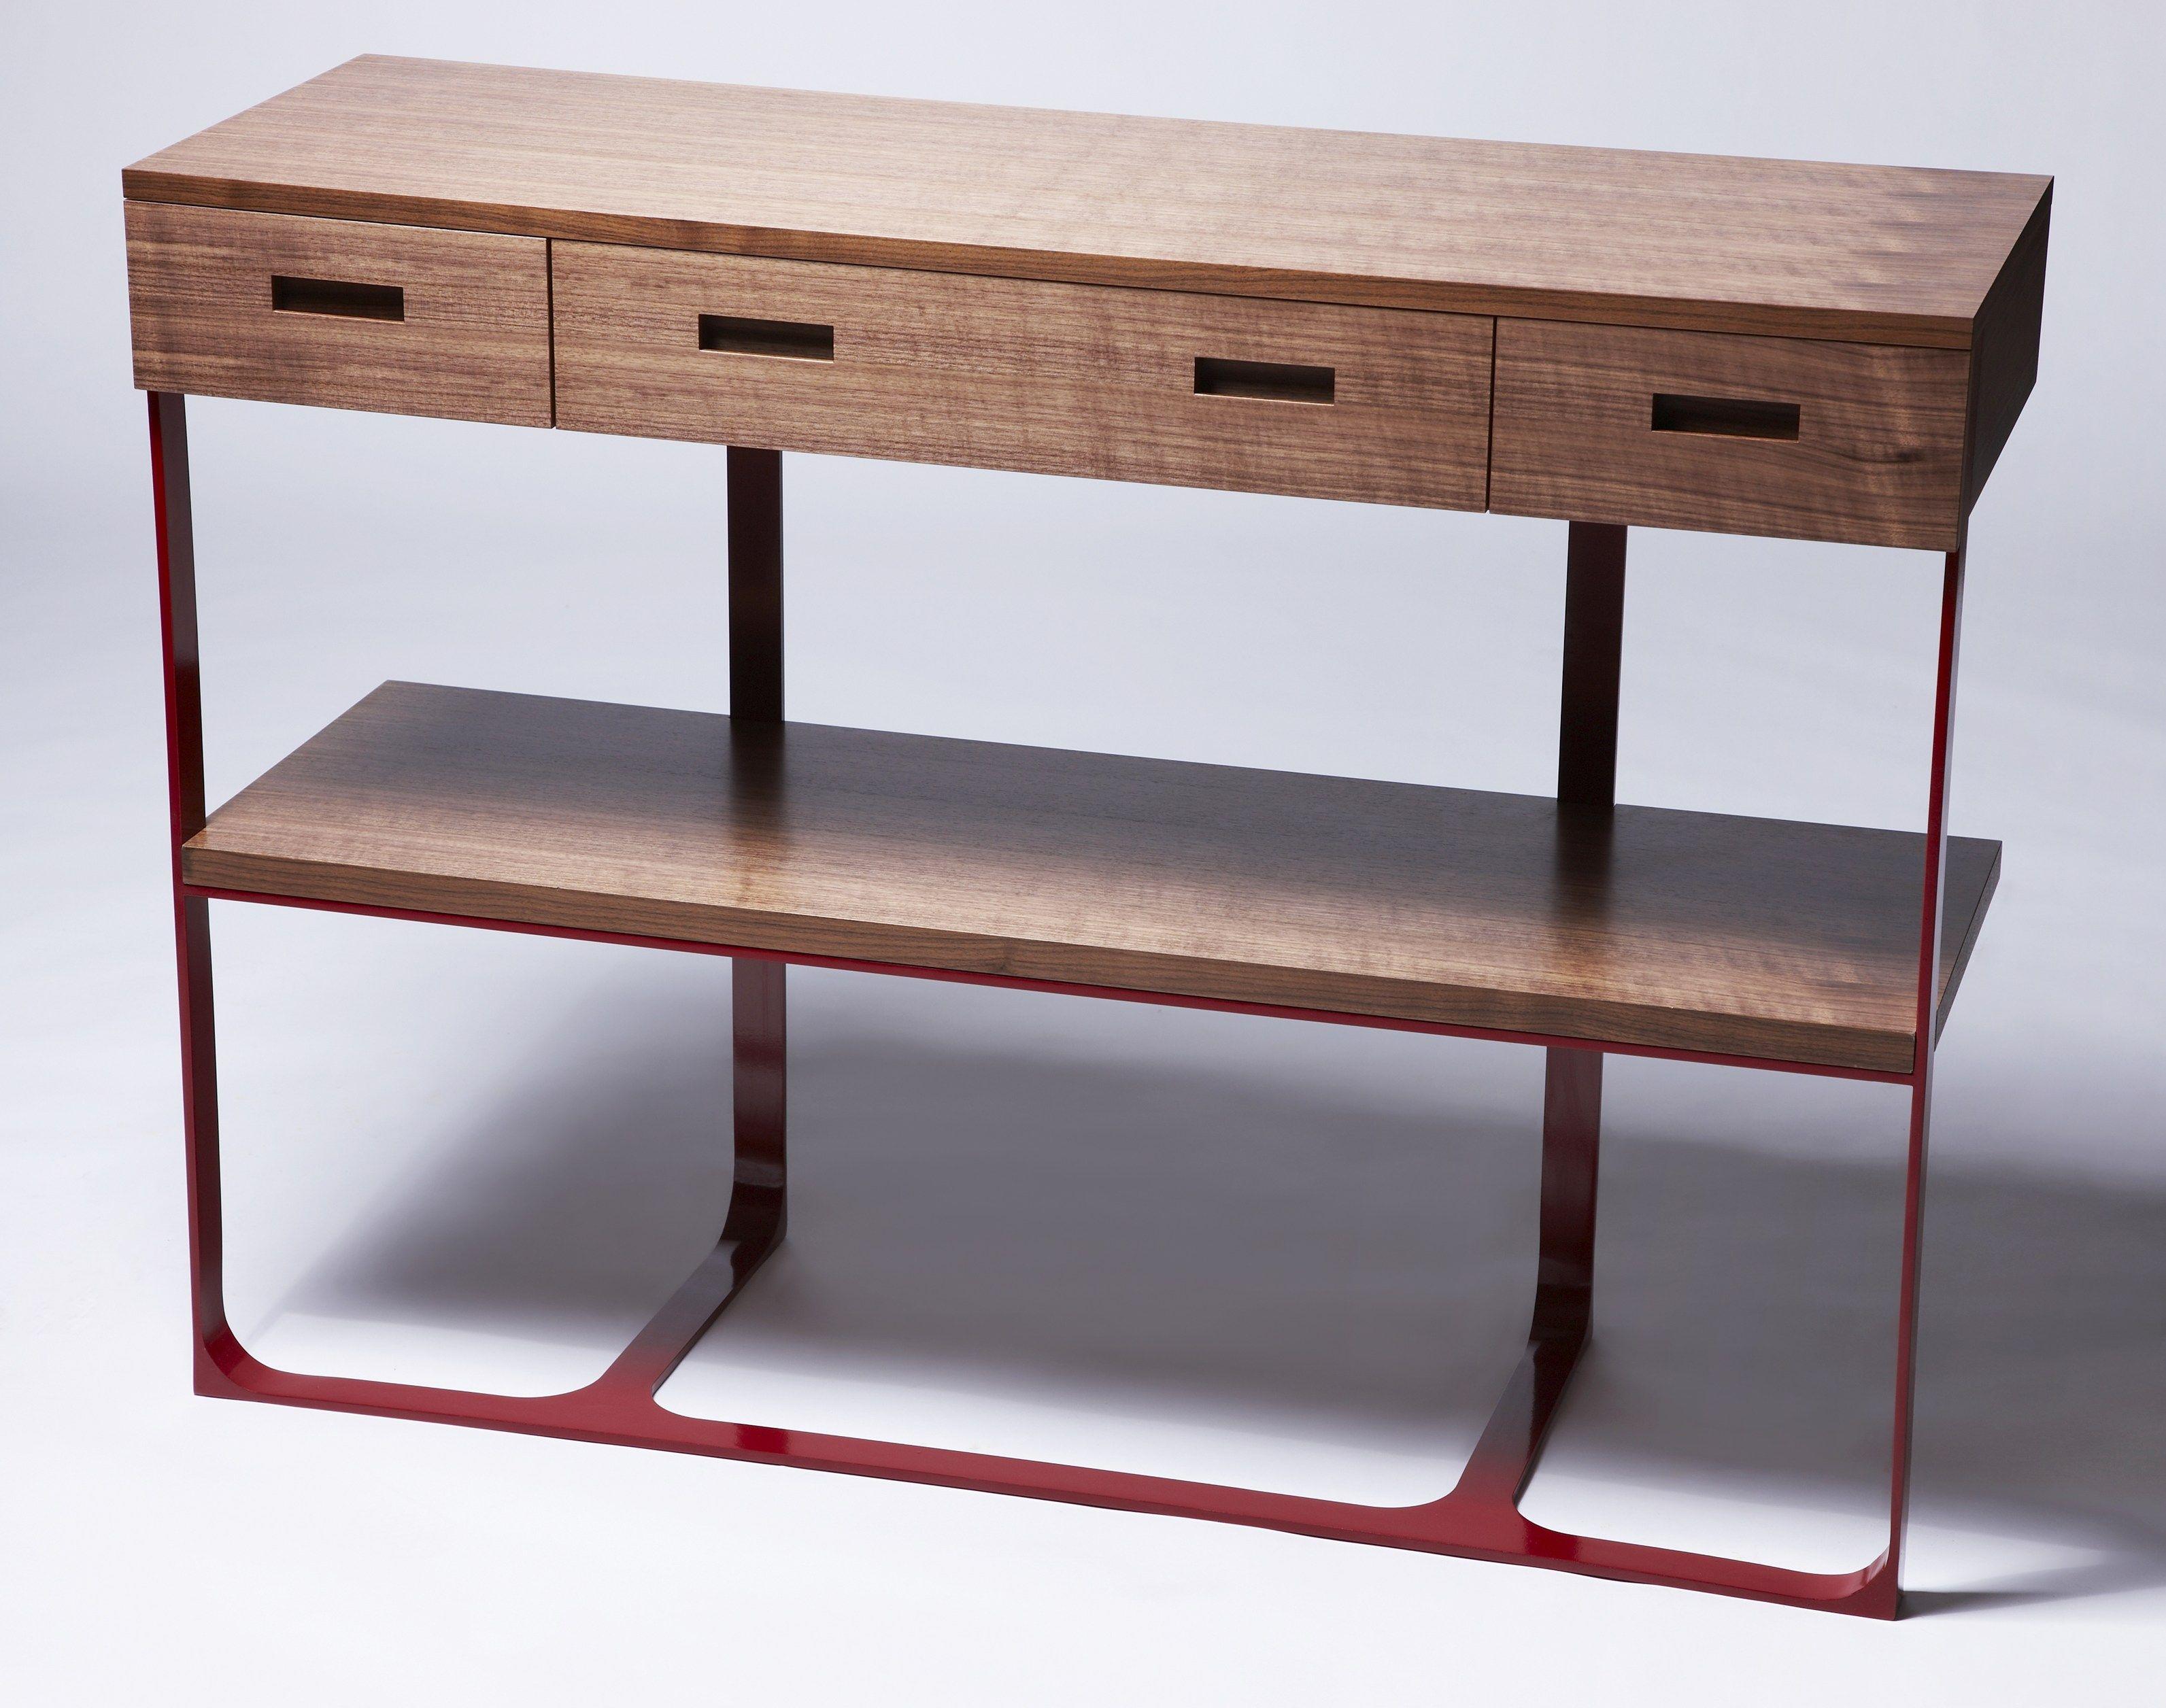 matilda stuhl raum und m beldesign inspiration. Black Bedroom Furniture Sets. Home Design Ideas